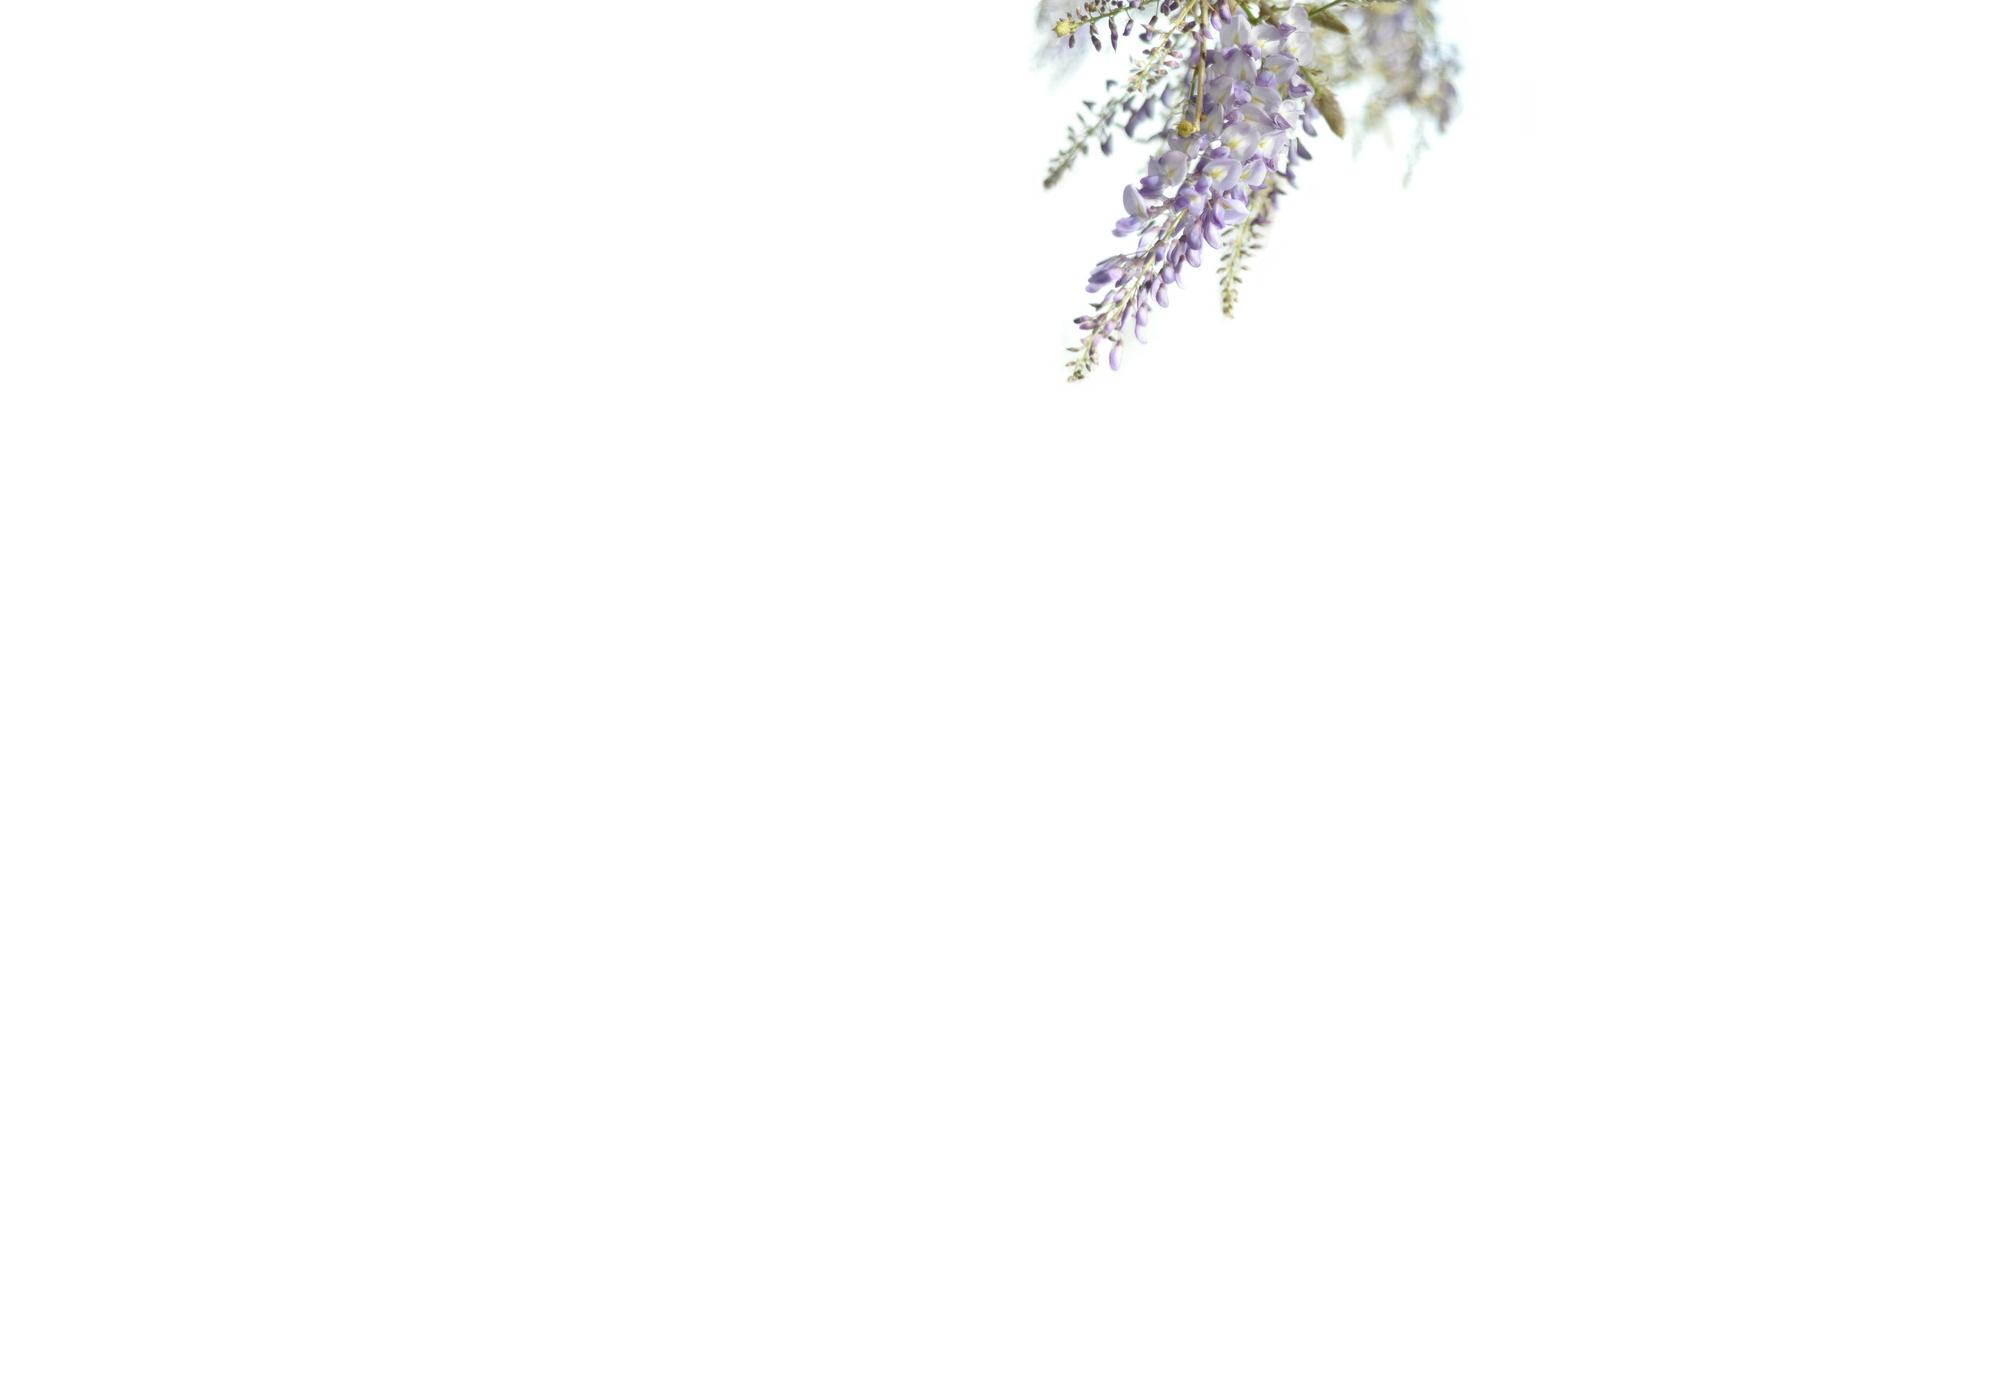 wisteria background